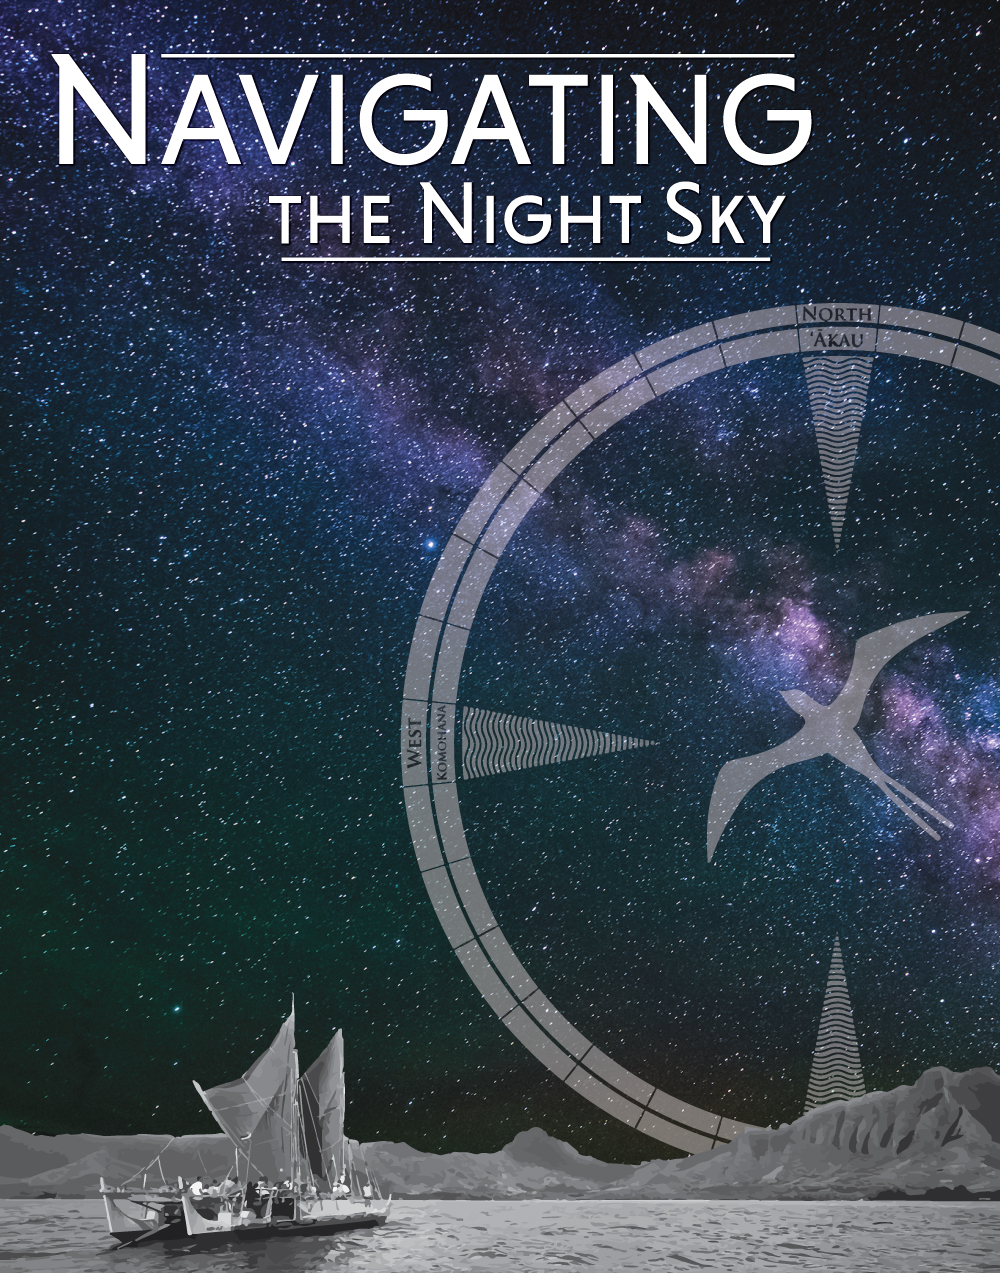 Navigating-the-Night-Sky-Website.jpg